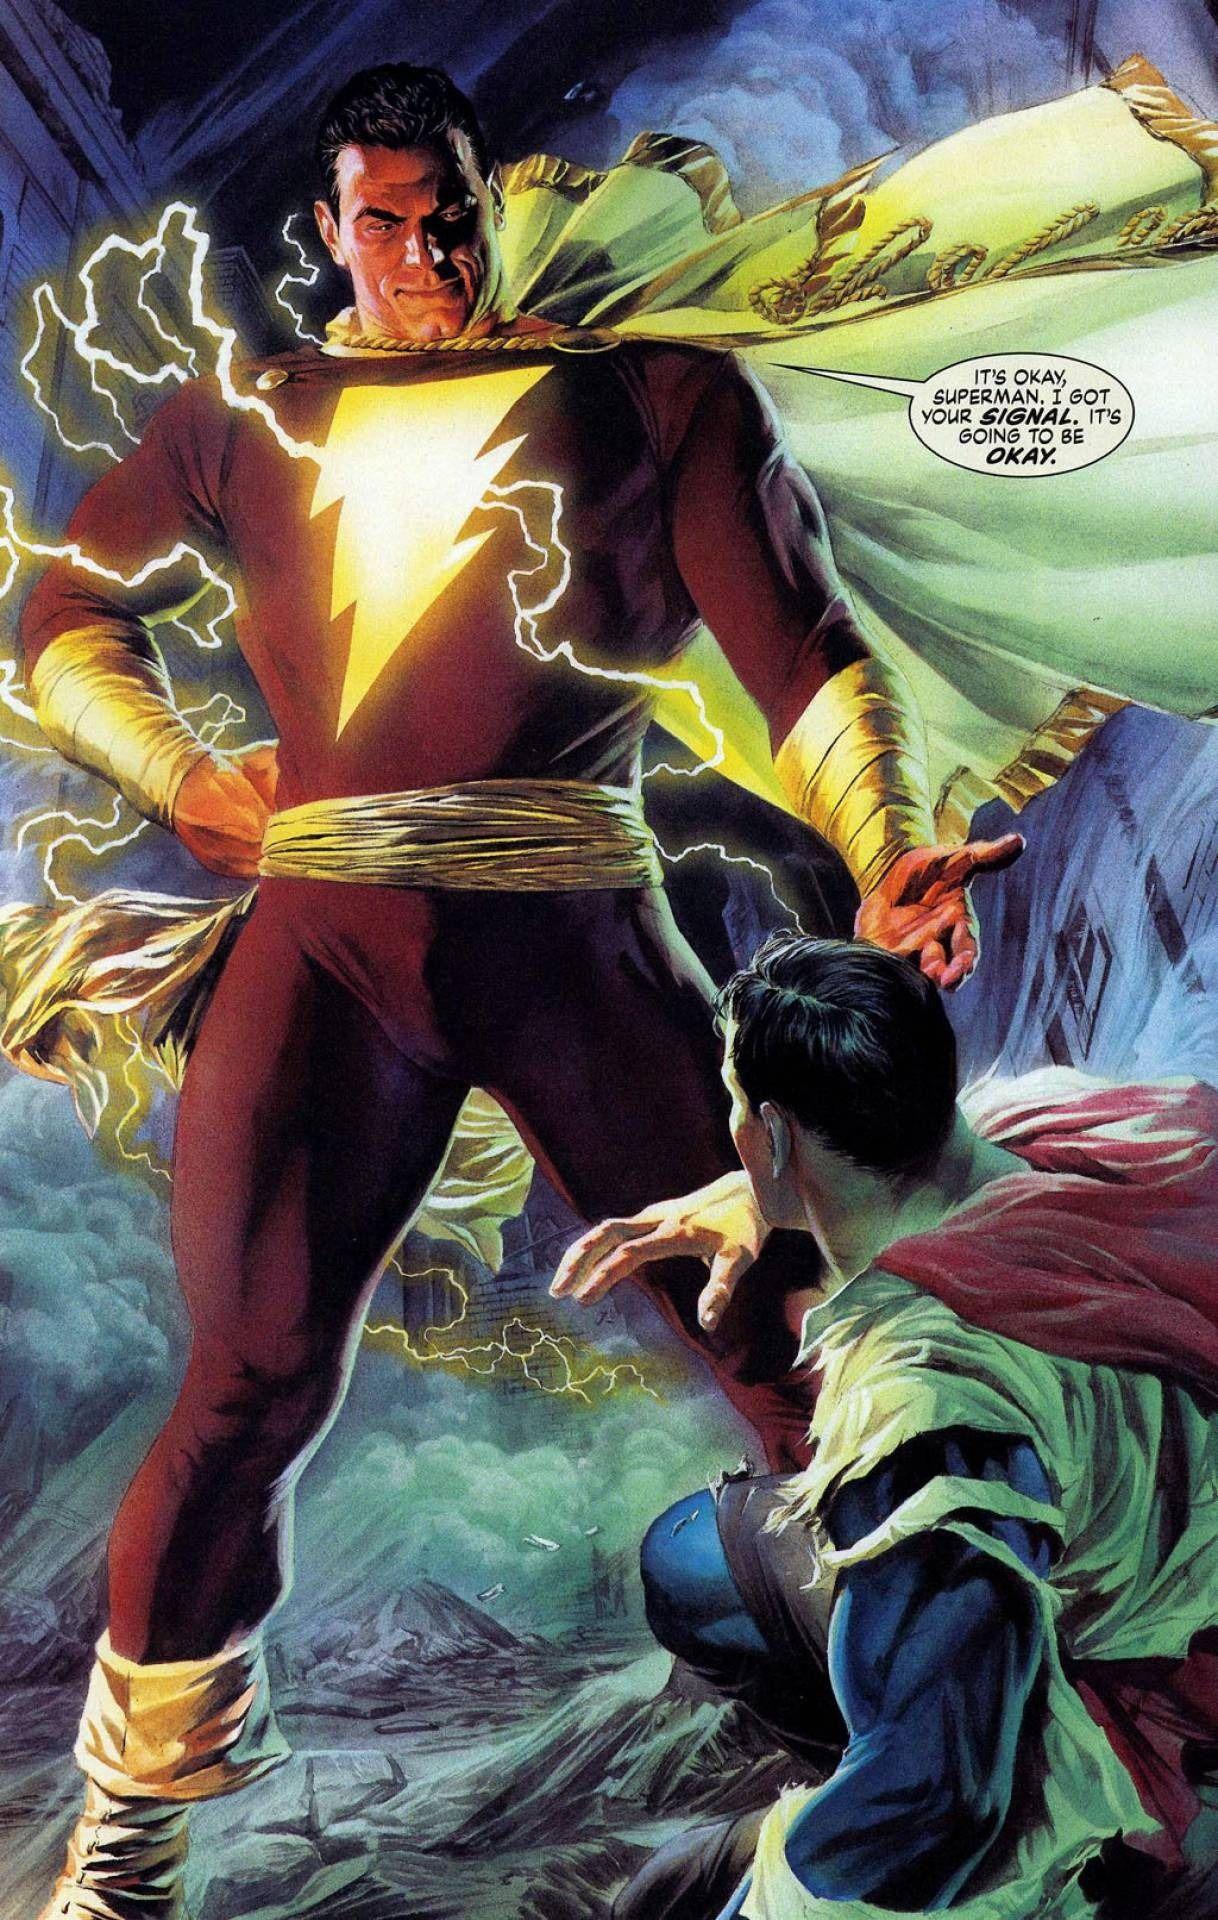 Shazam Fan Art Captian Marvel Helps Superman By Alex Ross